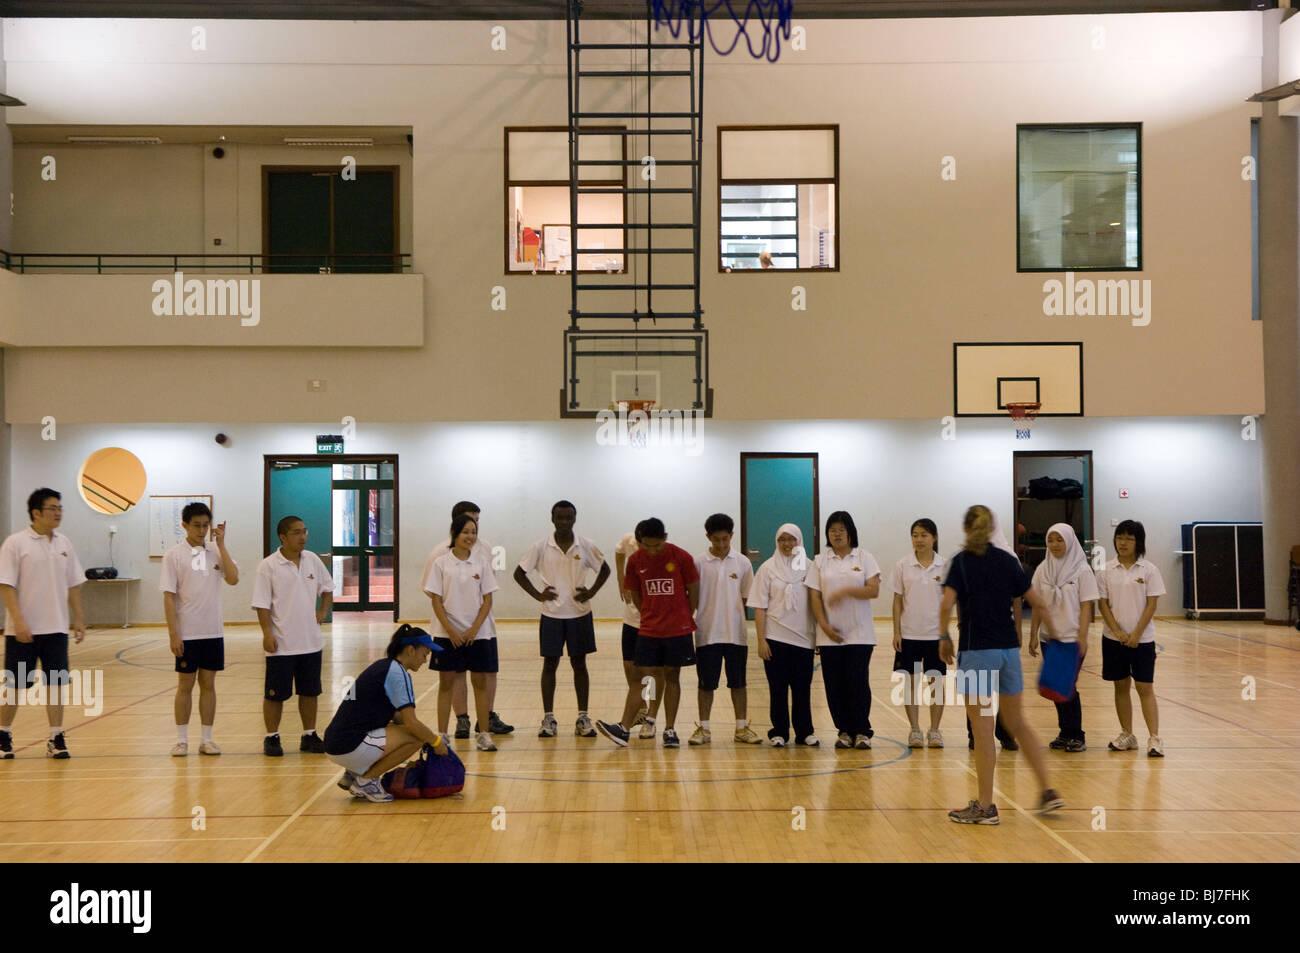 Gym, International School, Bandar Seri Begawan,Brunei Darussalam - Stock Image